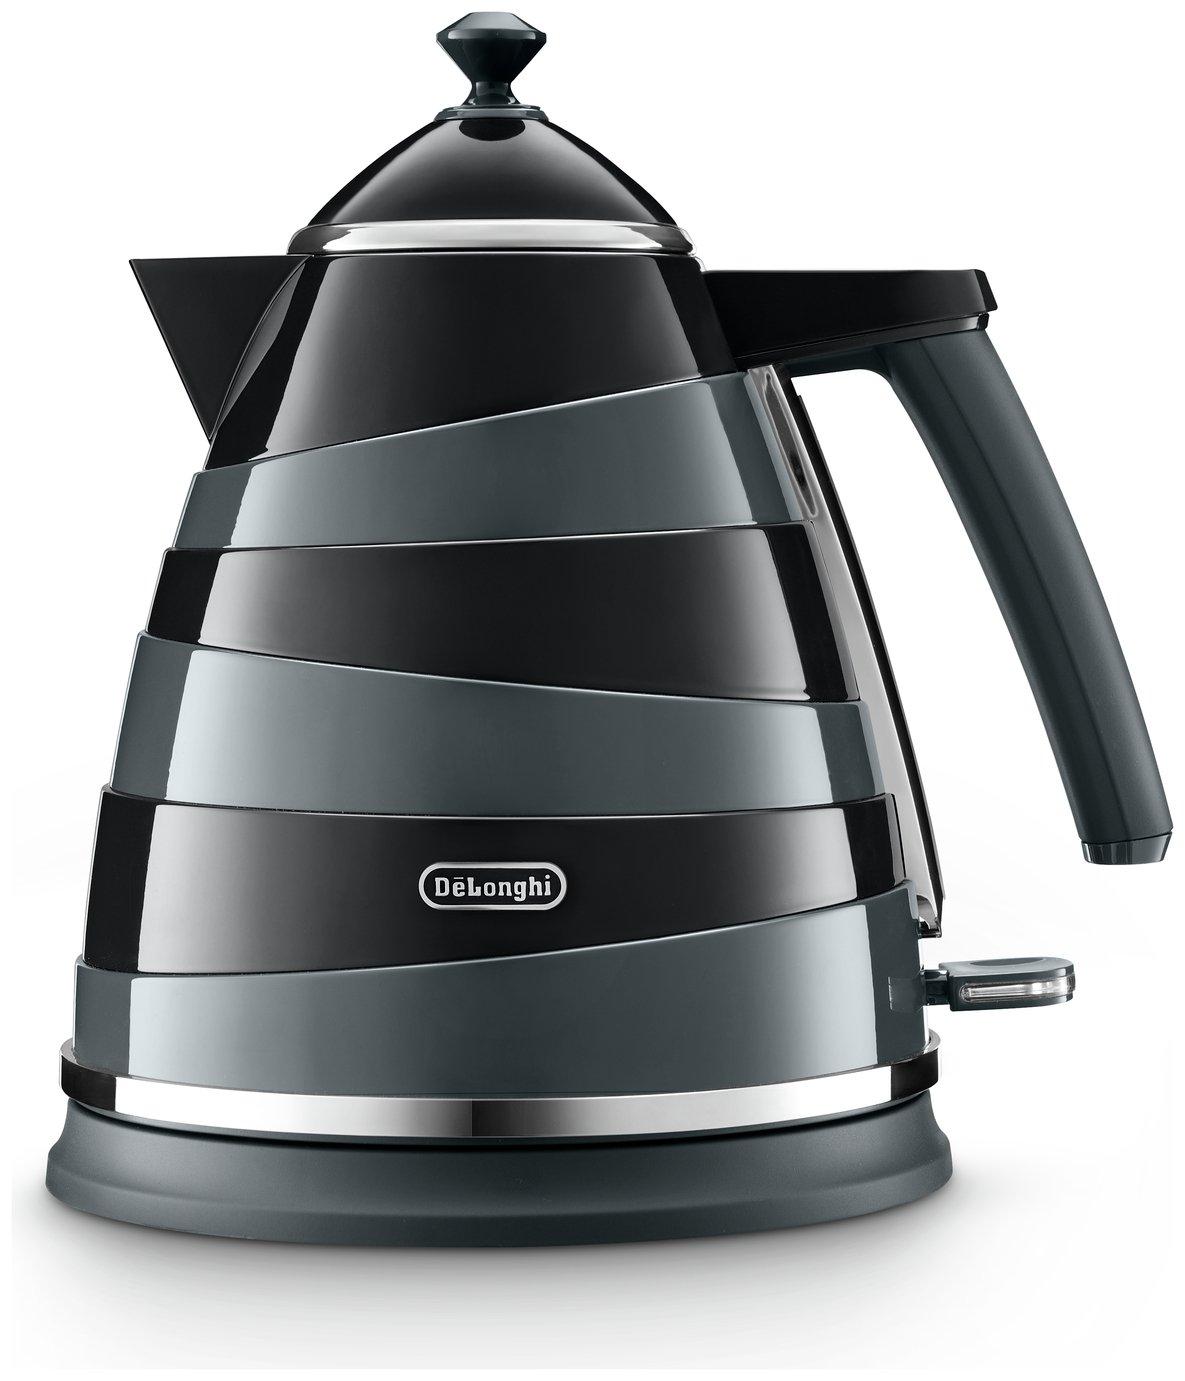 DeLonghi KBAC3001.BK Avvolta Kettle - Black & Grey